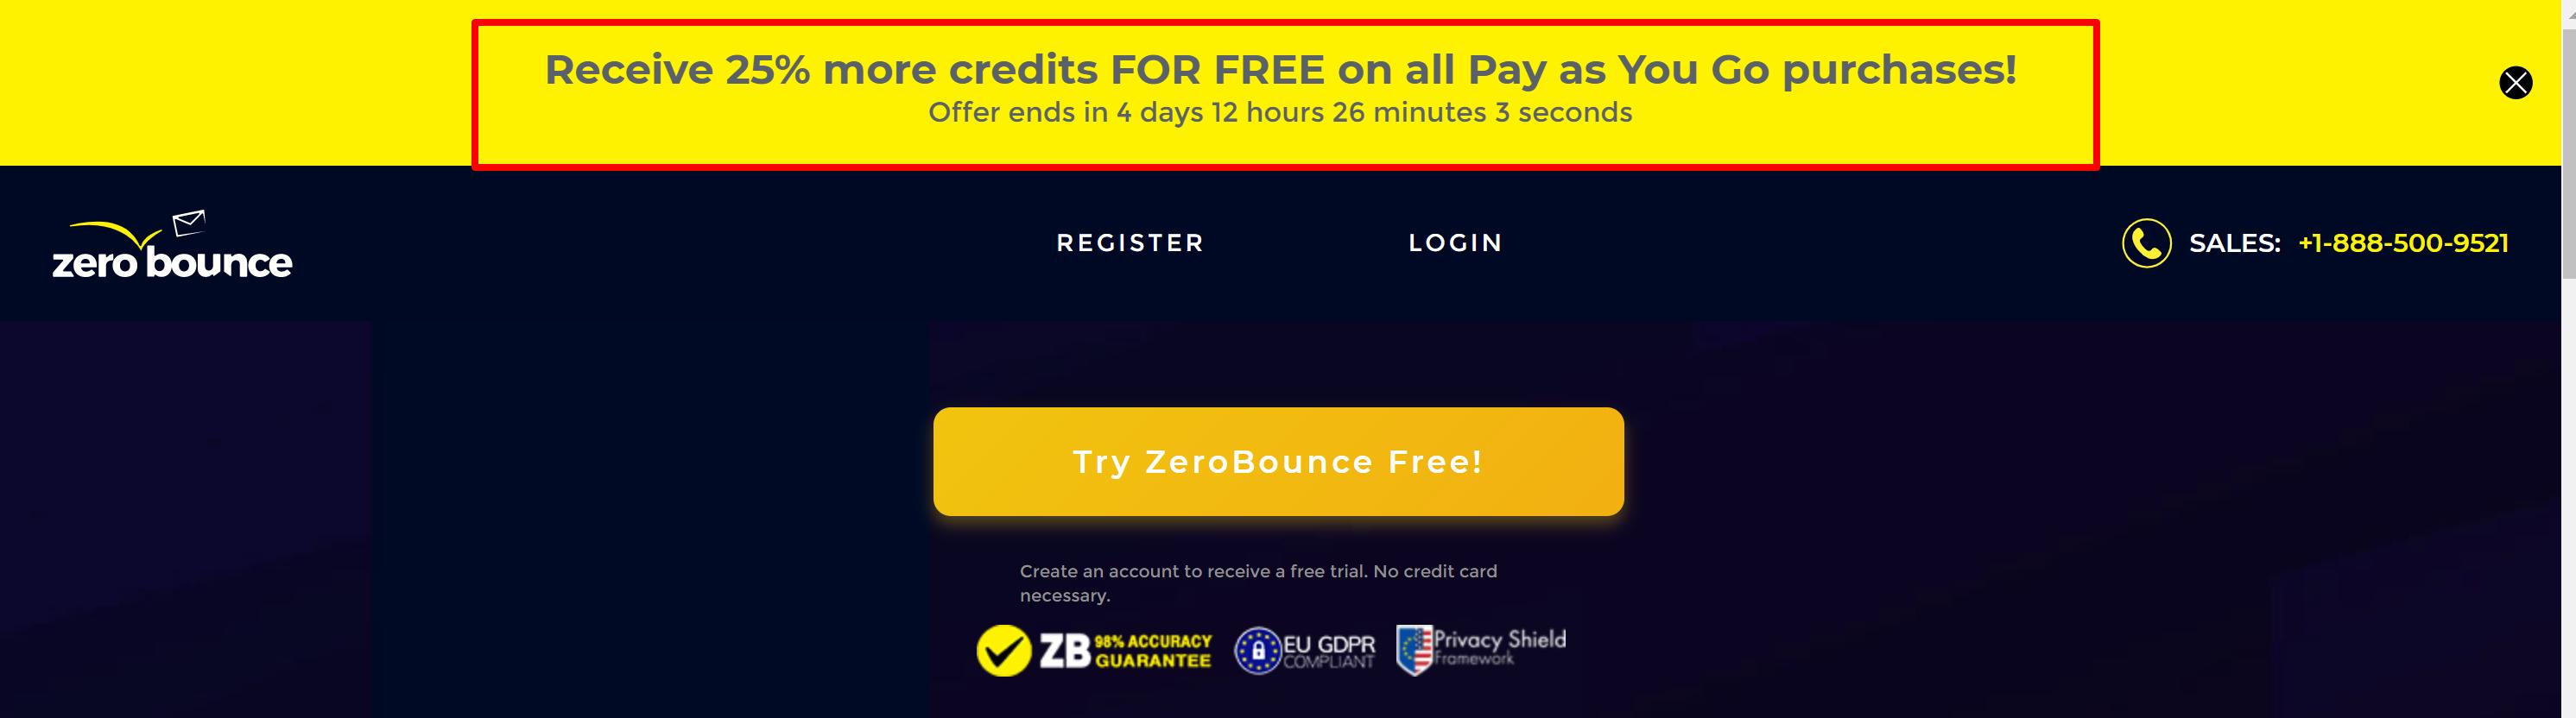 ZeroBounce free credits